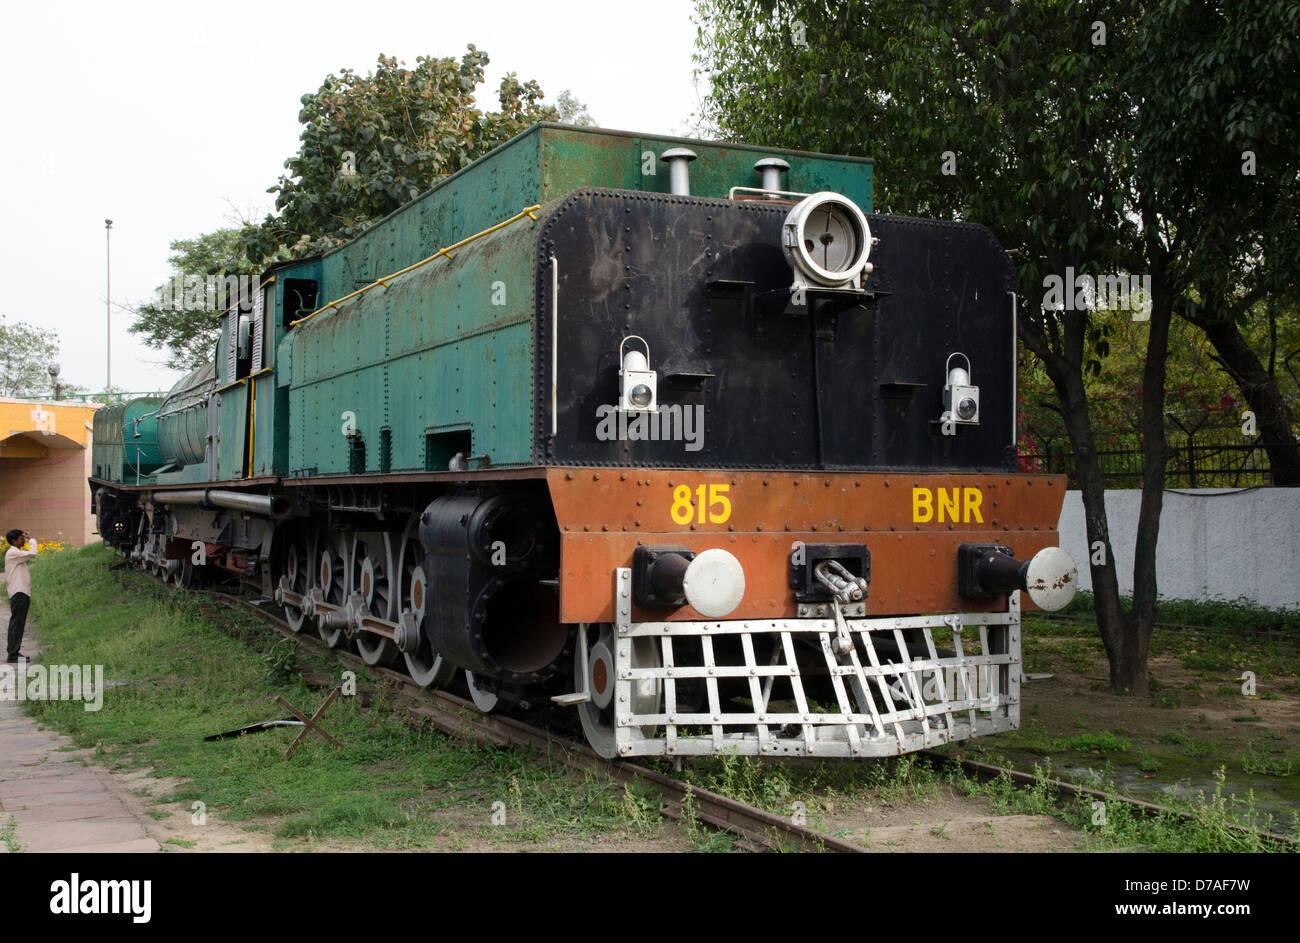 steam locomotive class N 815 beyer-peacock national railway museum chanakyapuri new delhi india - Stock Image